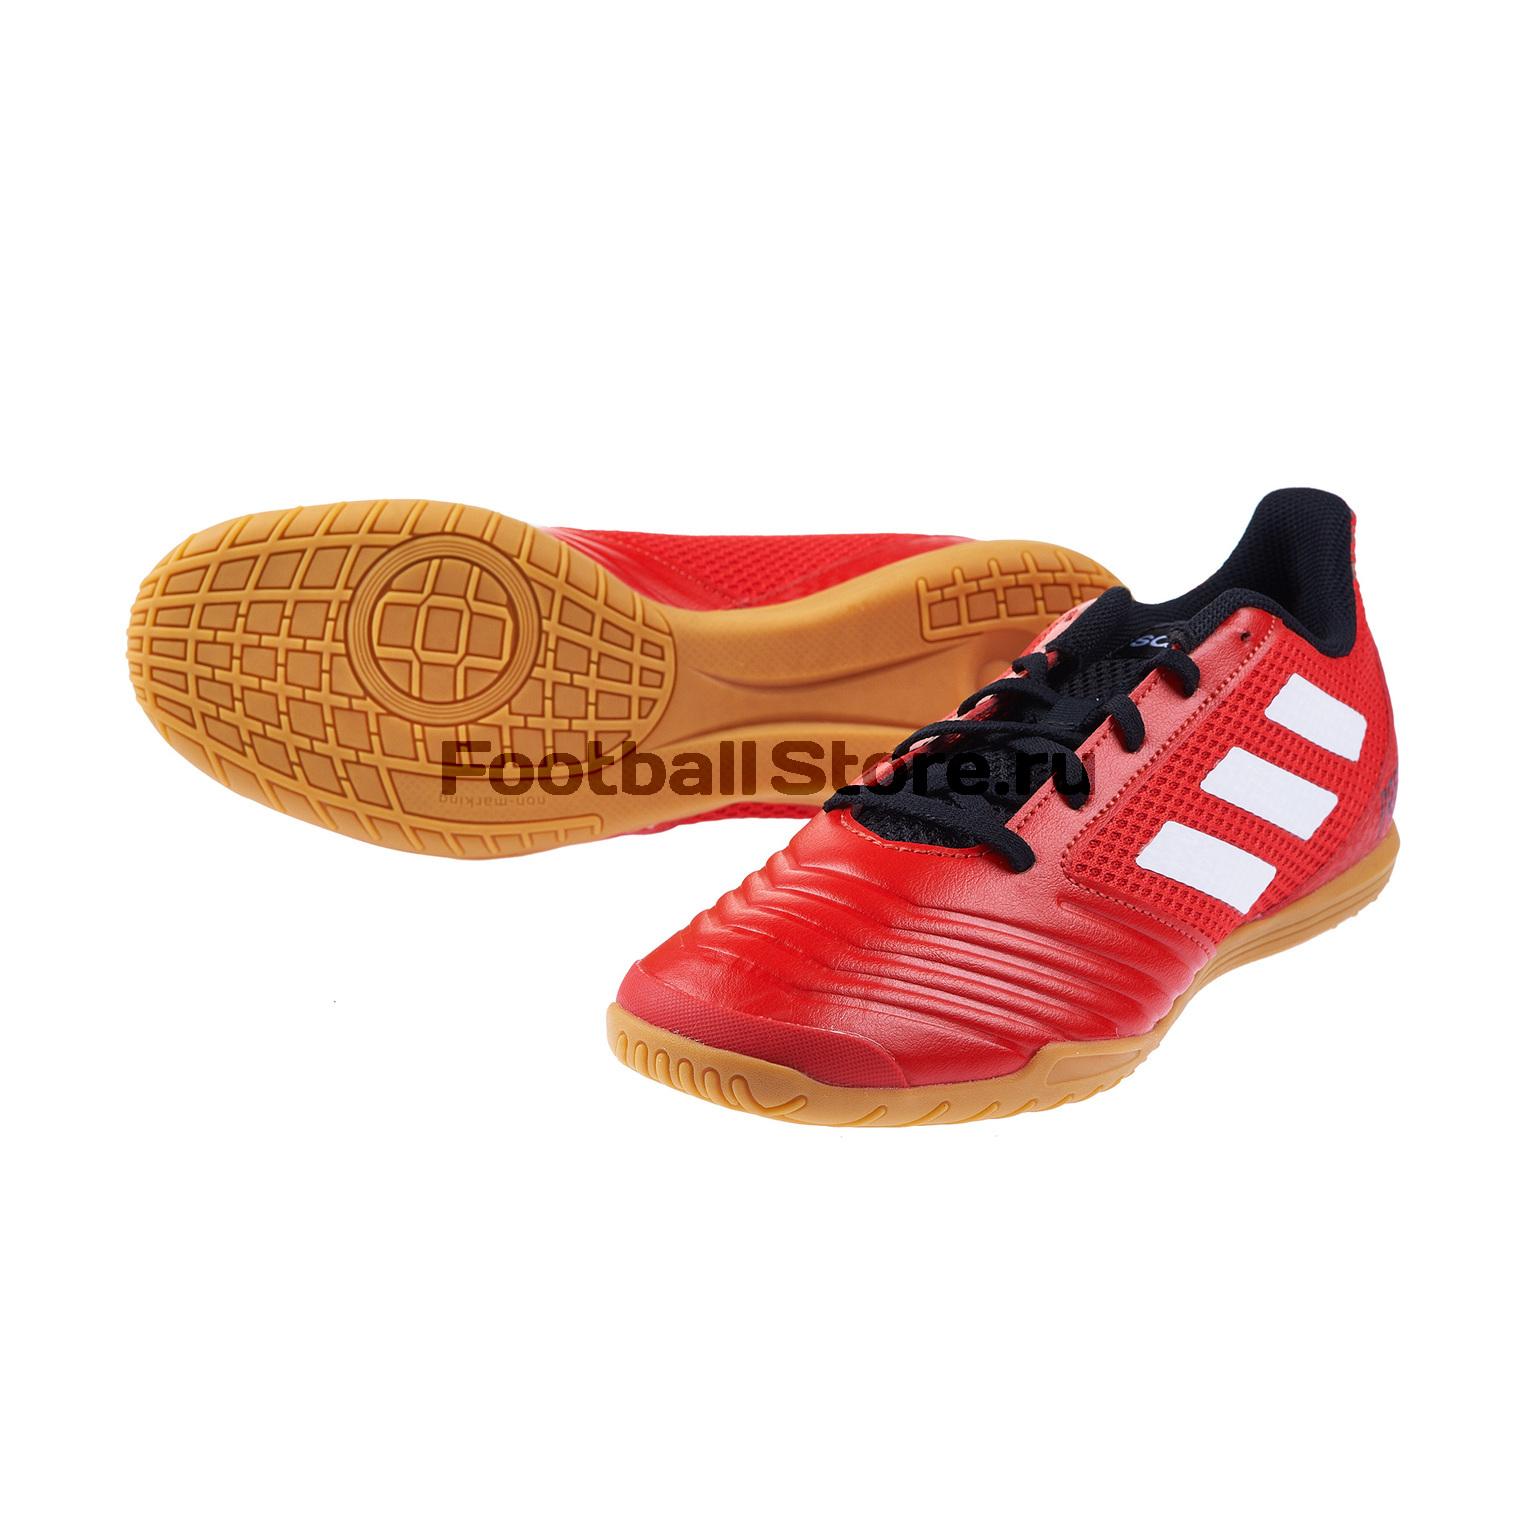 3e48c1c5 Футзалки Adidas Predator Tango 18.4 Sala DB2172 – купить футзалки в ...